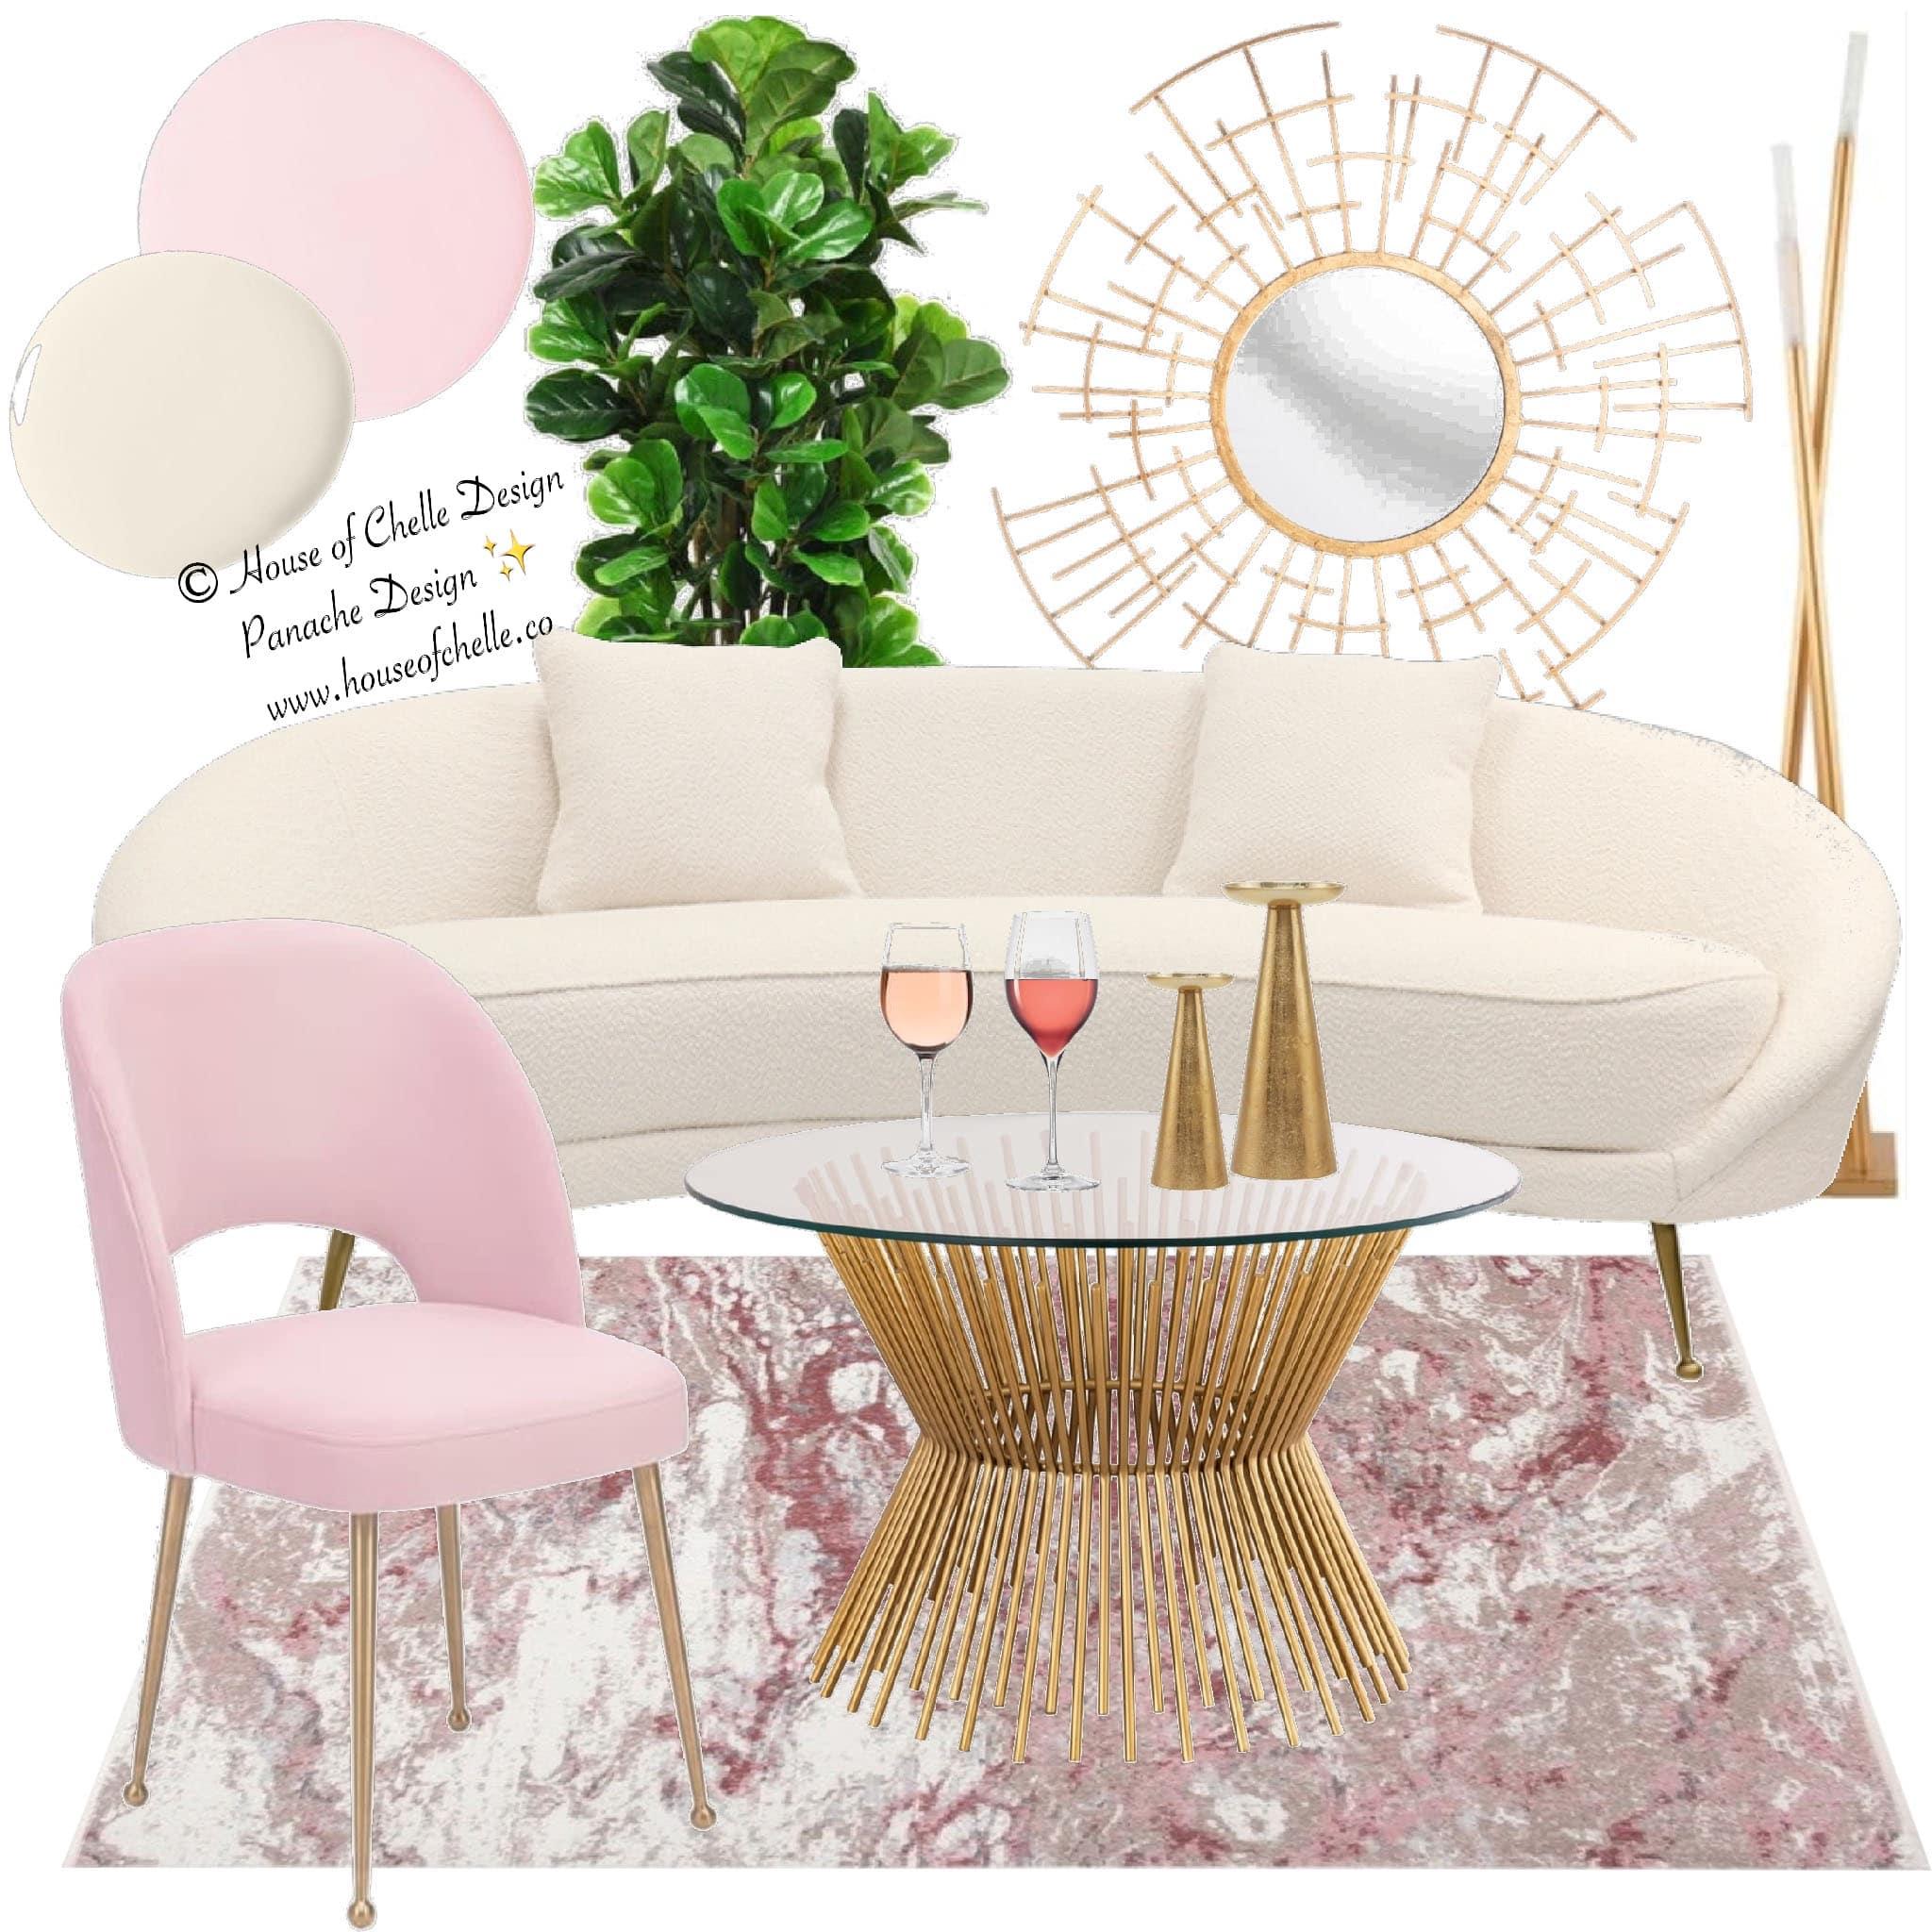 Online Interior Design Living Room Shop The Look Board 5 13 2020 Panache Design